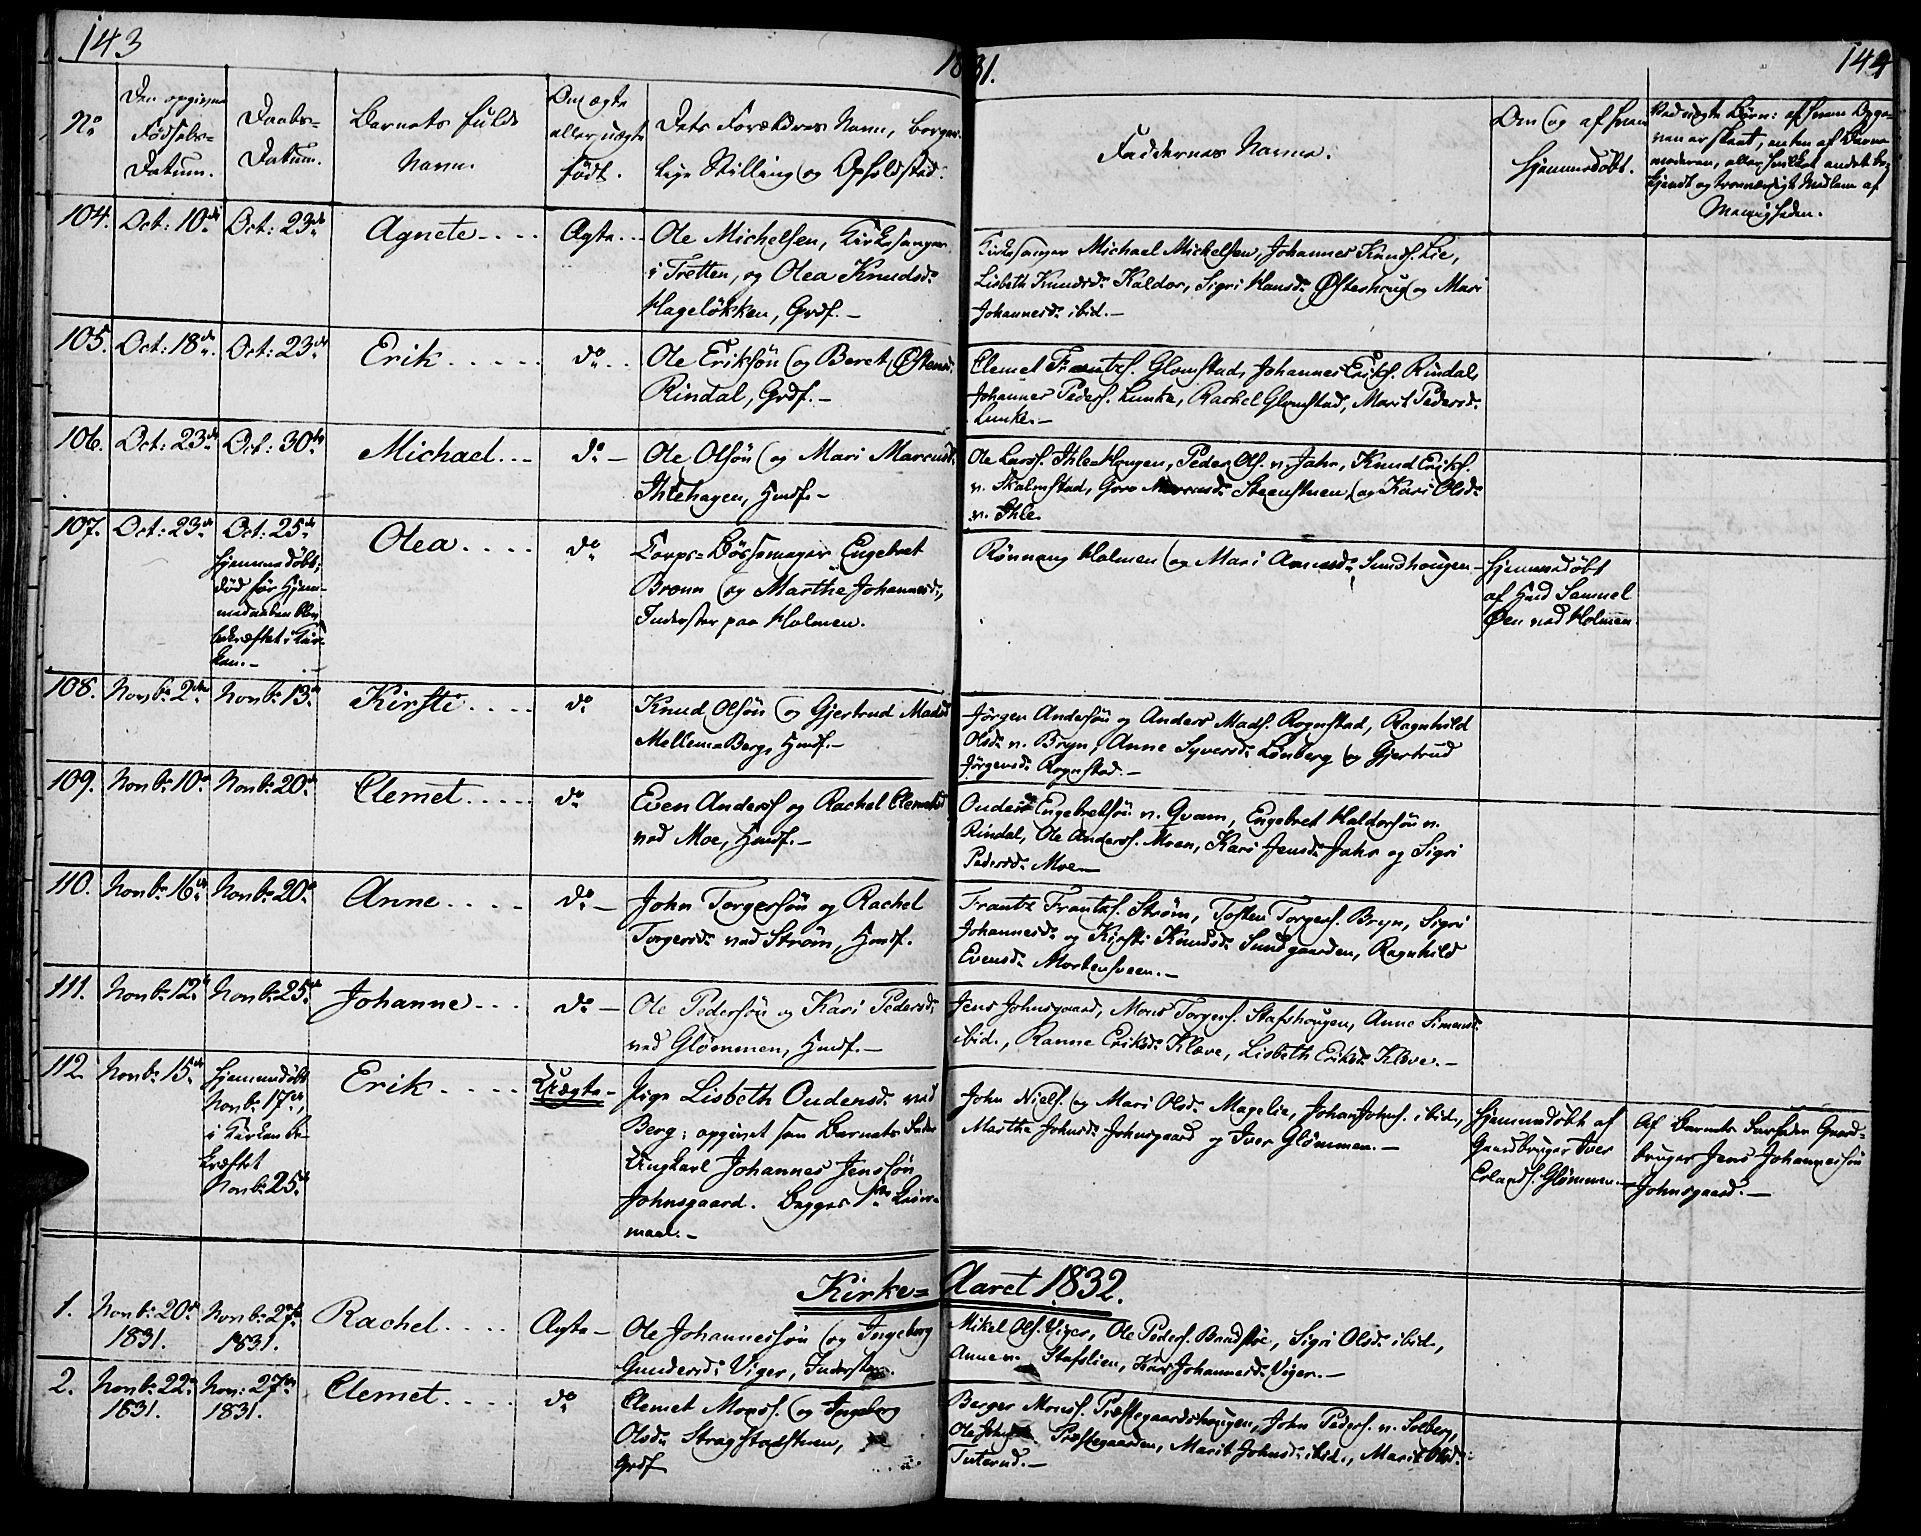 SAH, Øyer prestekontor, Ministerialbok nr. 4, 1824-1841, s. 143-144